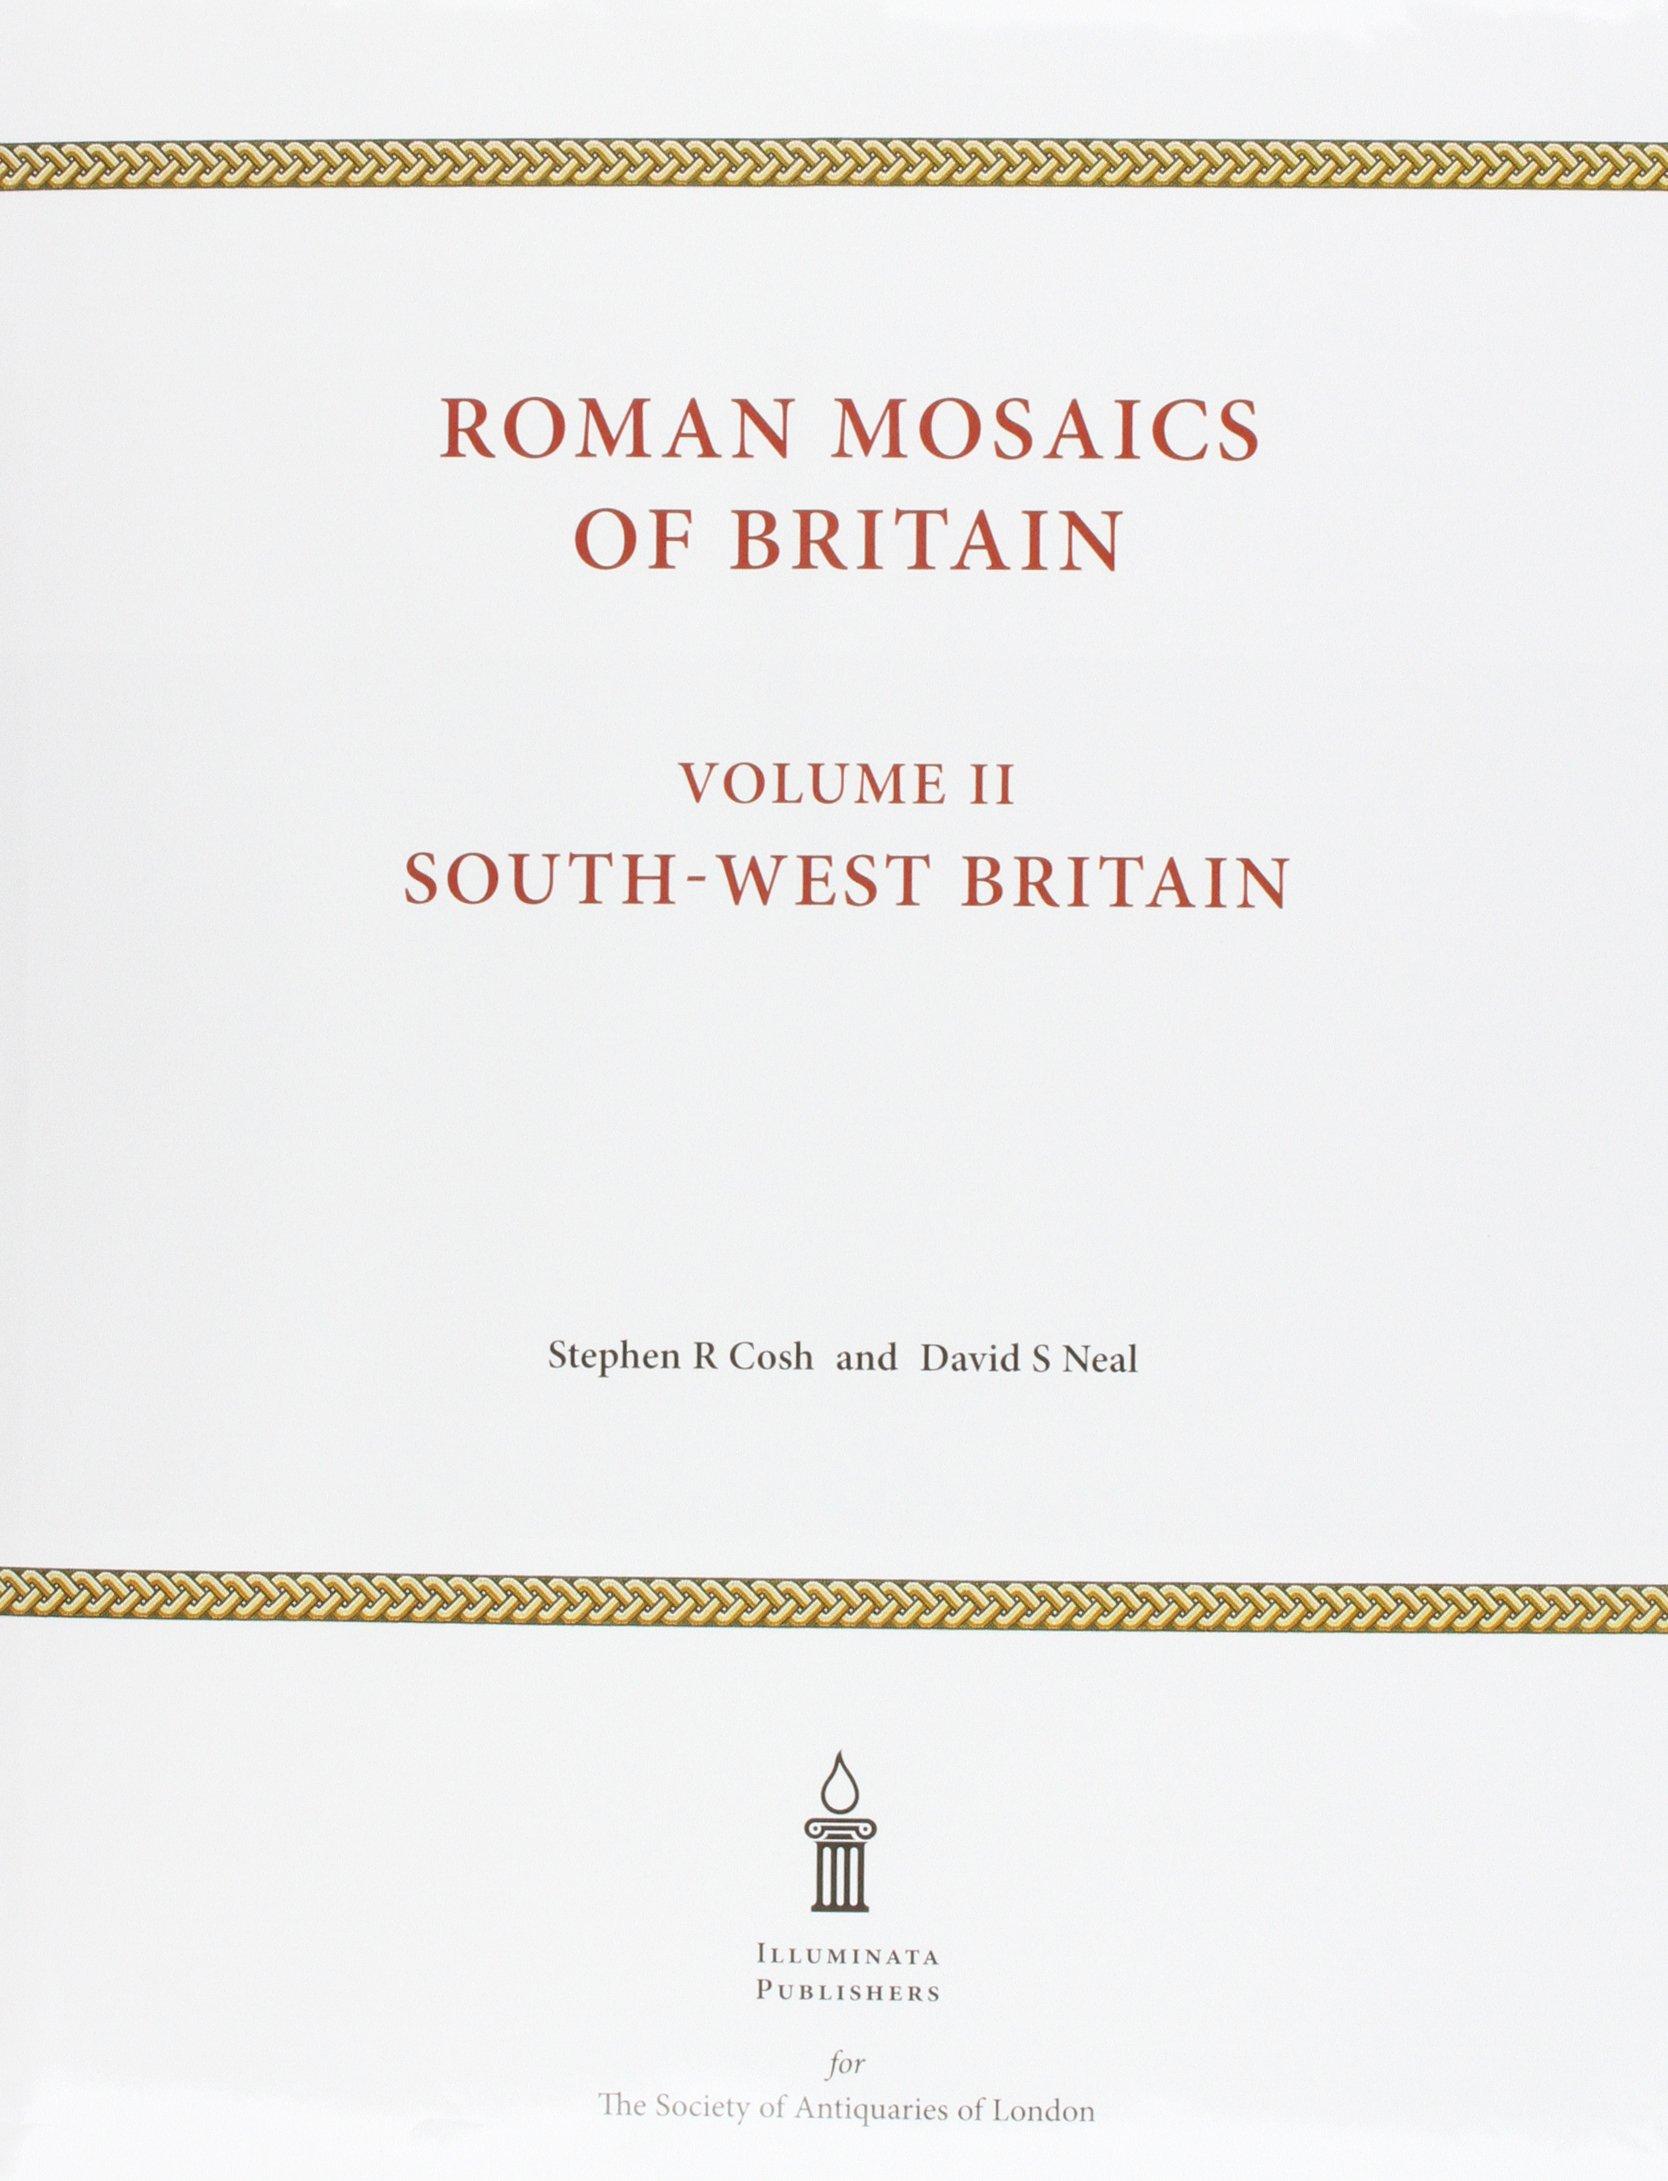 Roman Mosaics of Britain: Volume II: South-West Britain